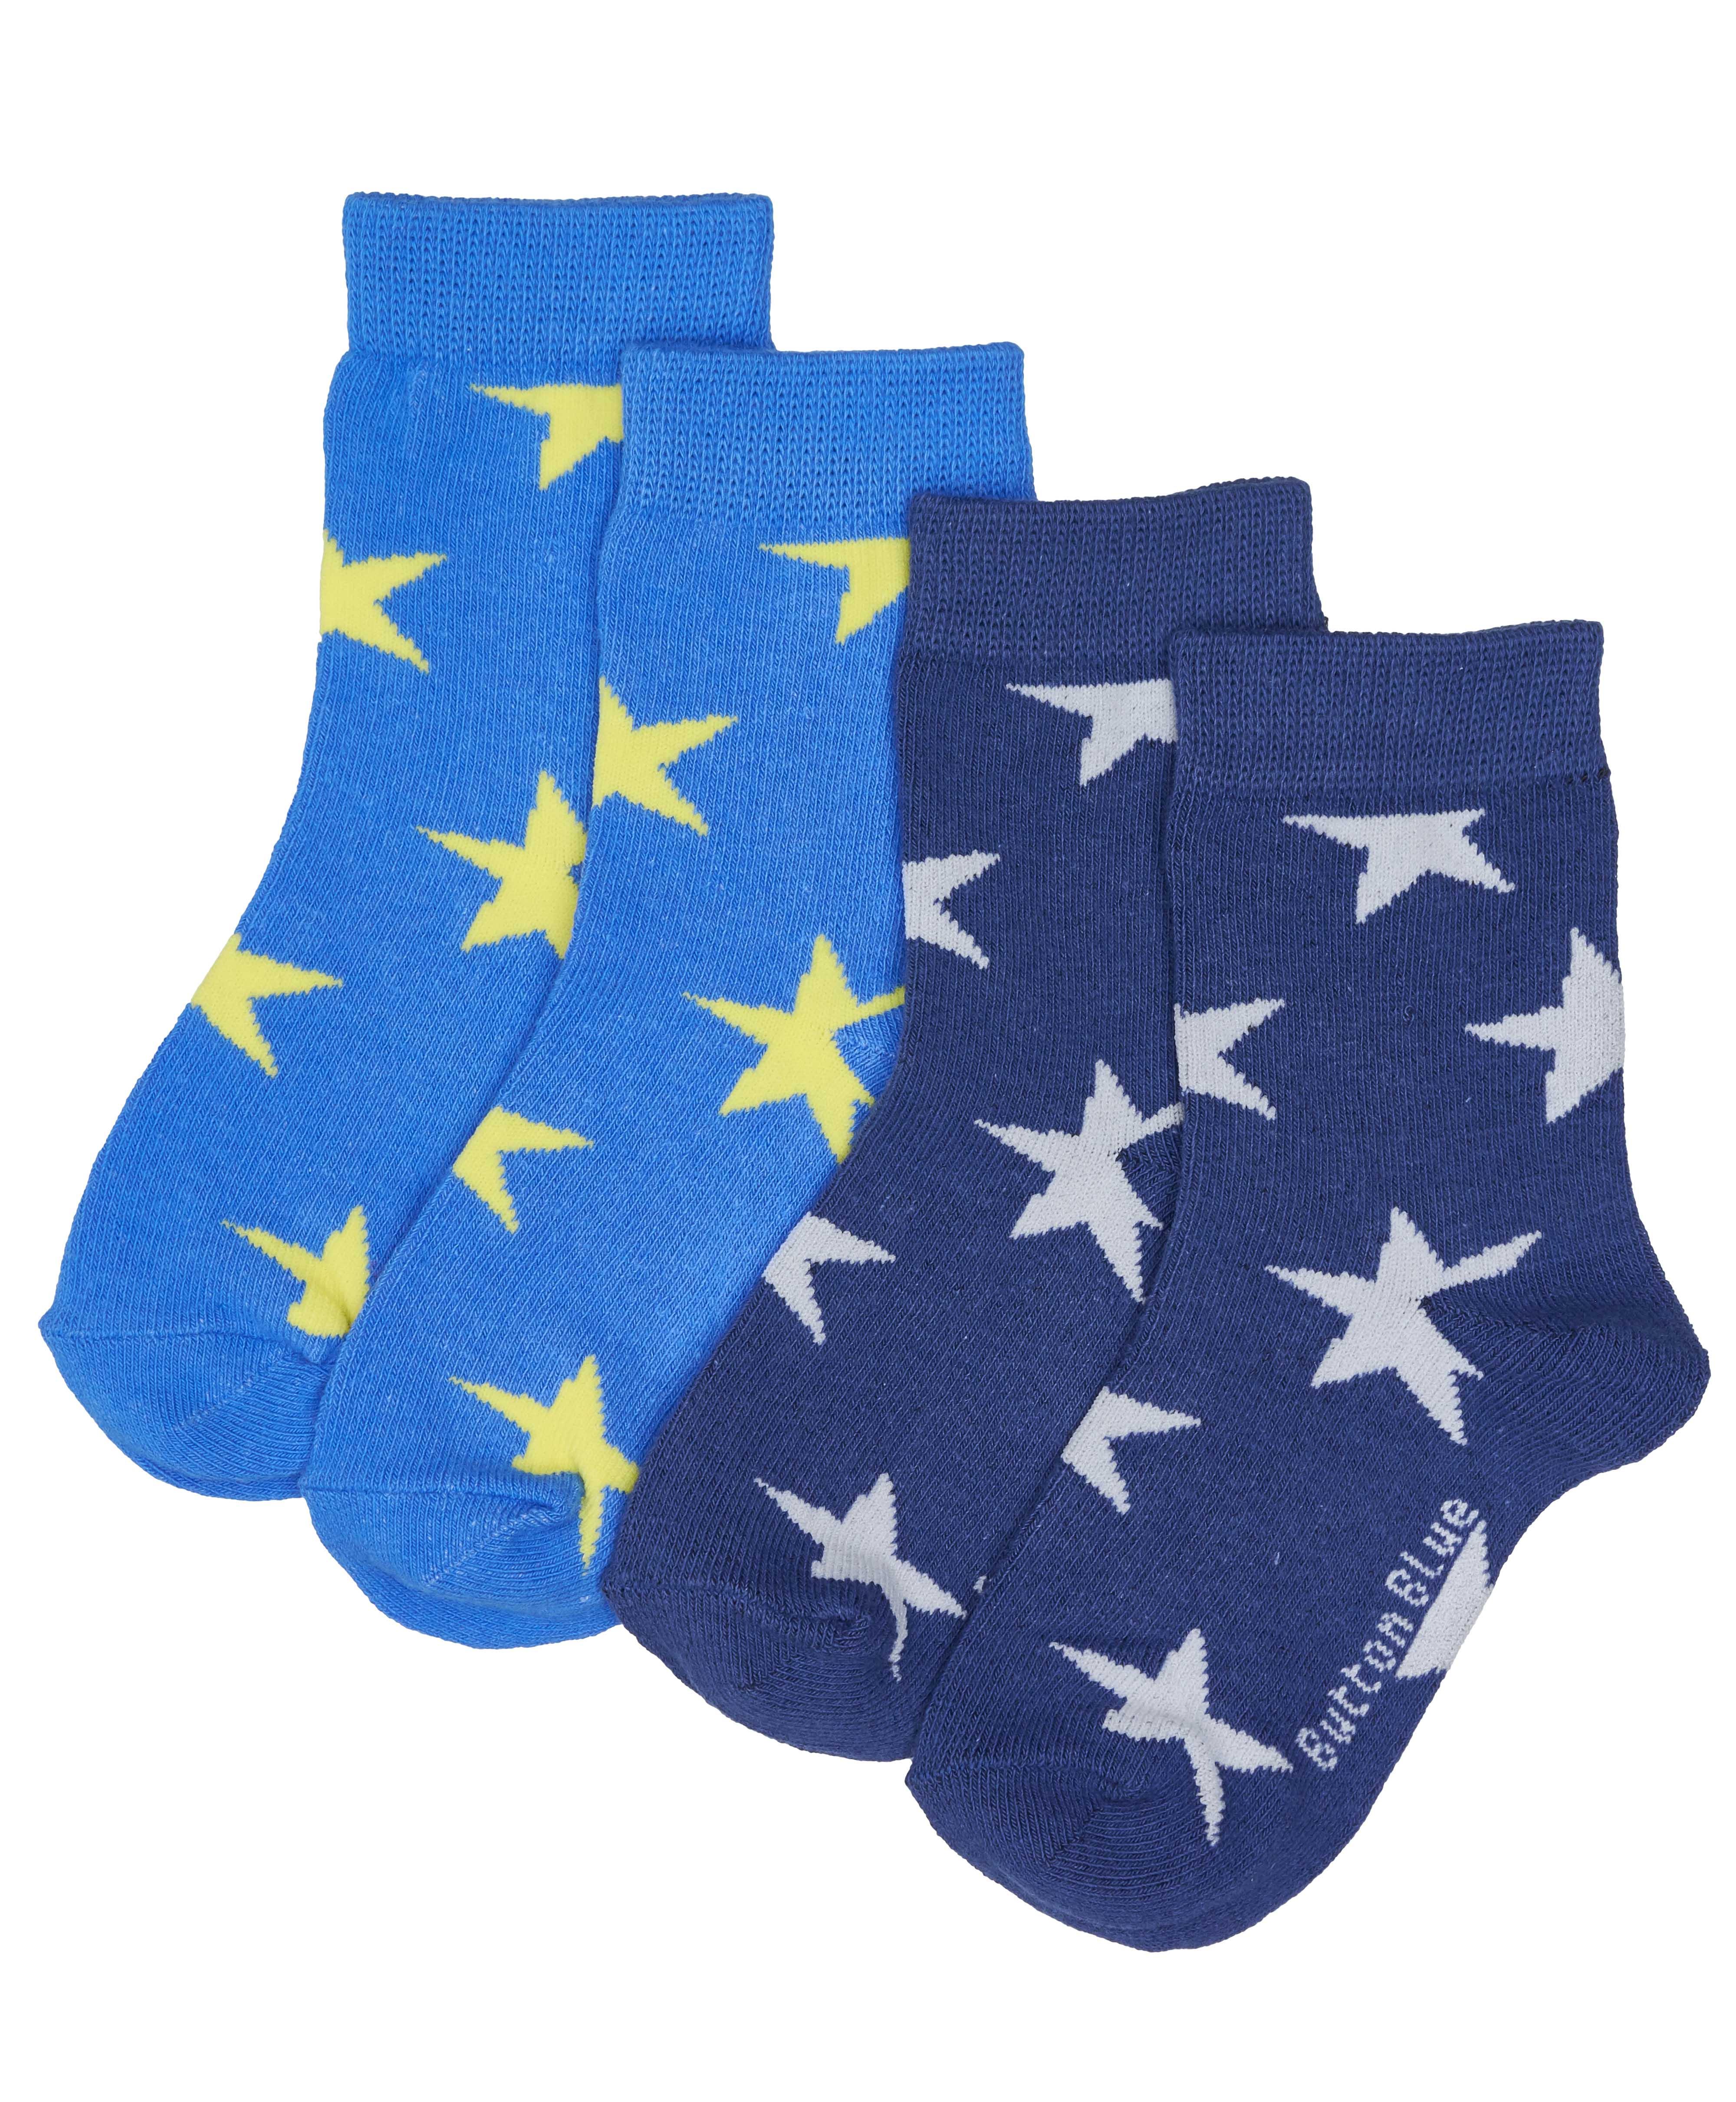 Купить 118BBBU85031001, Носки (комплект из 2 пар) Button Blue, темно-синий, 14-16, Мужской, ВЕСНА/ЛЕТО 2018 (shop: GulliverMarket Gulliver Market)